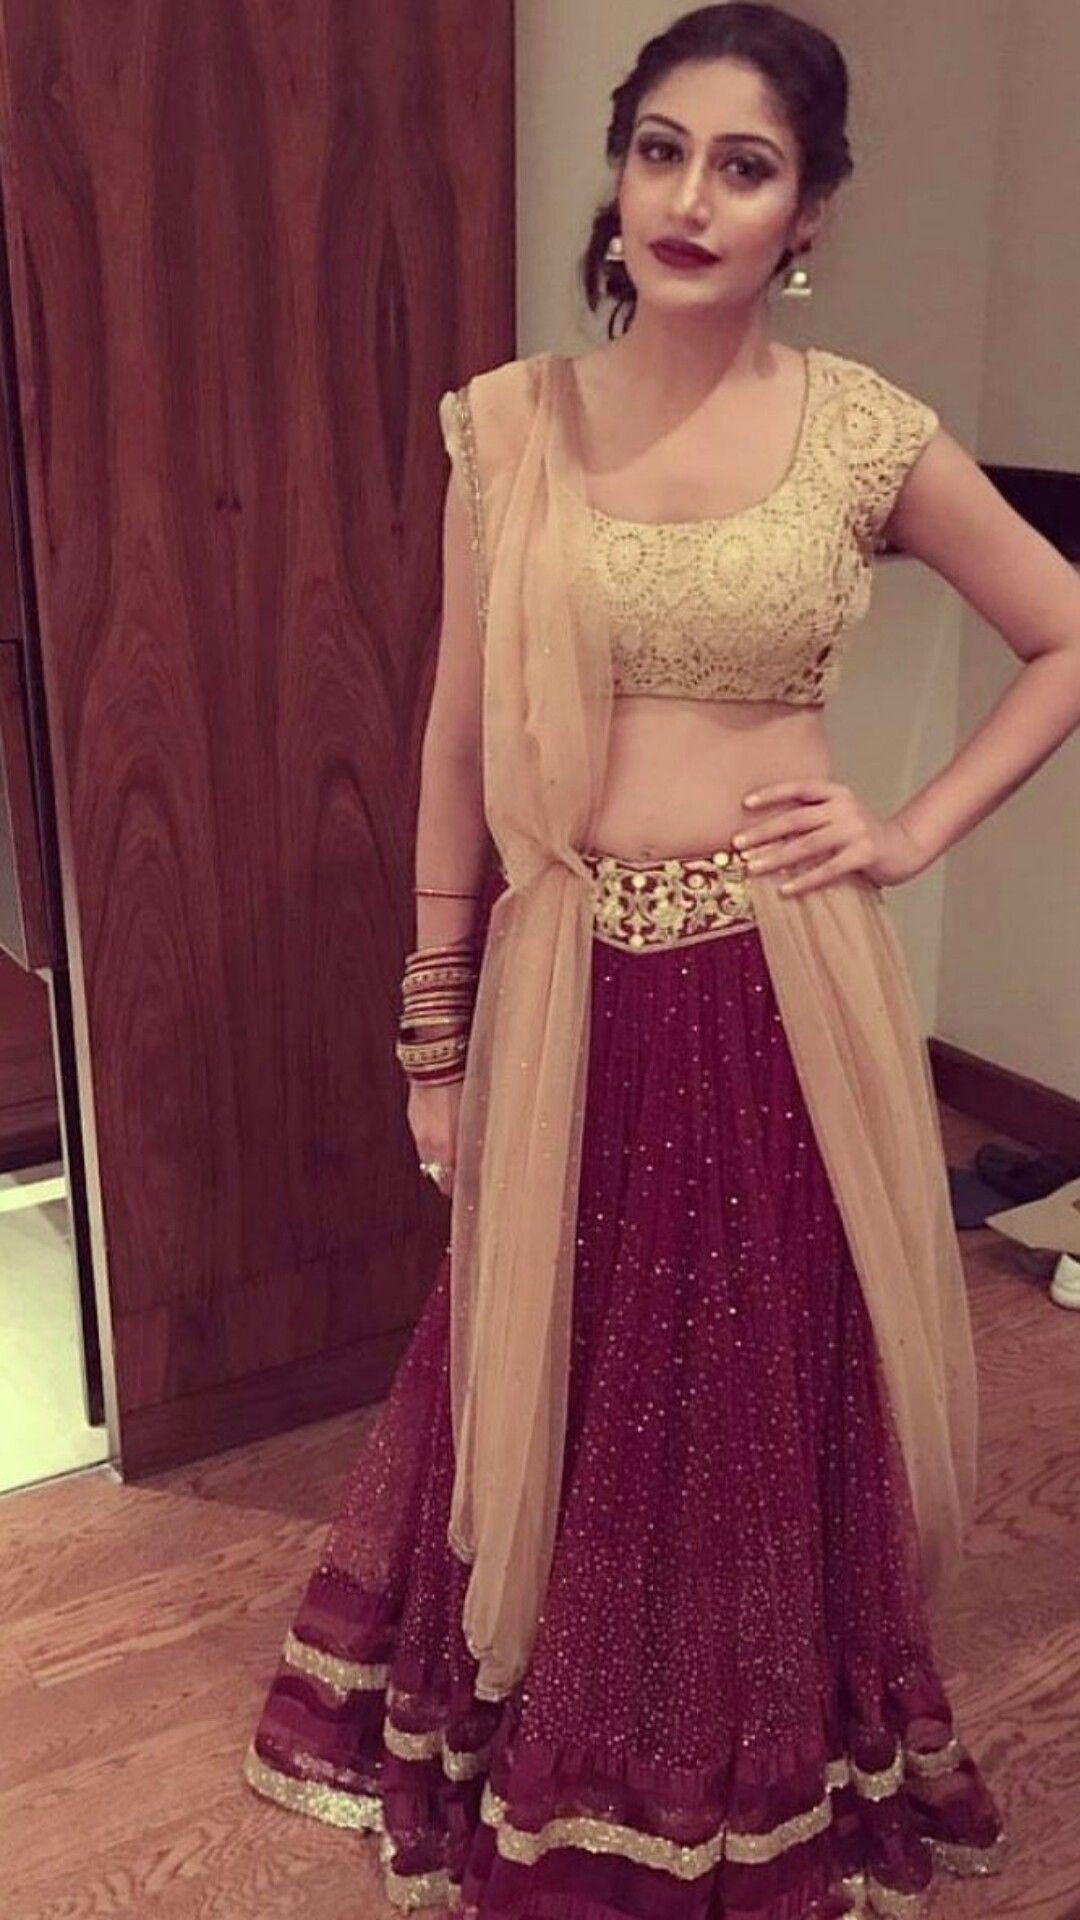 aba0a319714b5d Chandu is the best | Ishqbaaz | Surbhi chandna, Lehenga, Fashion